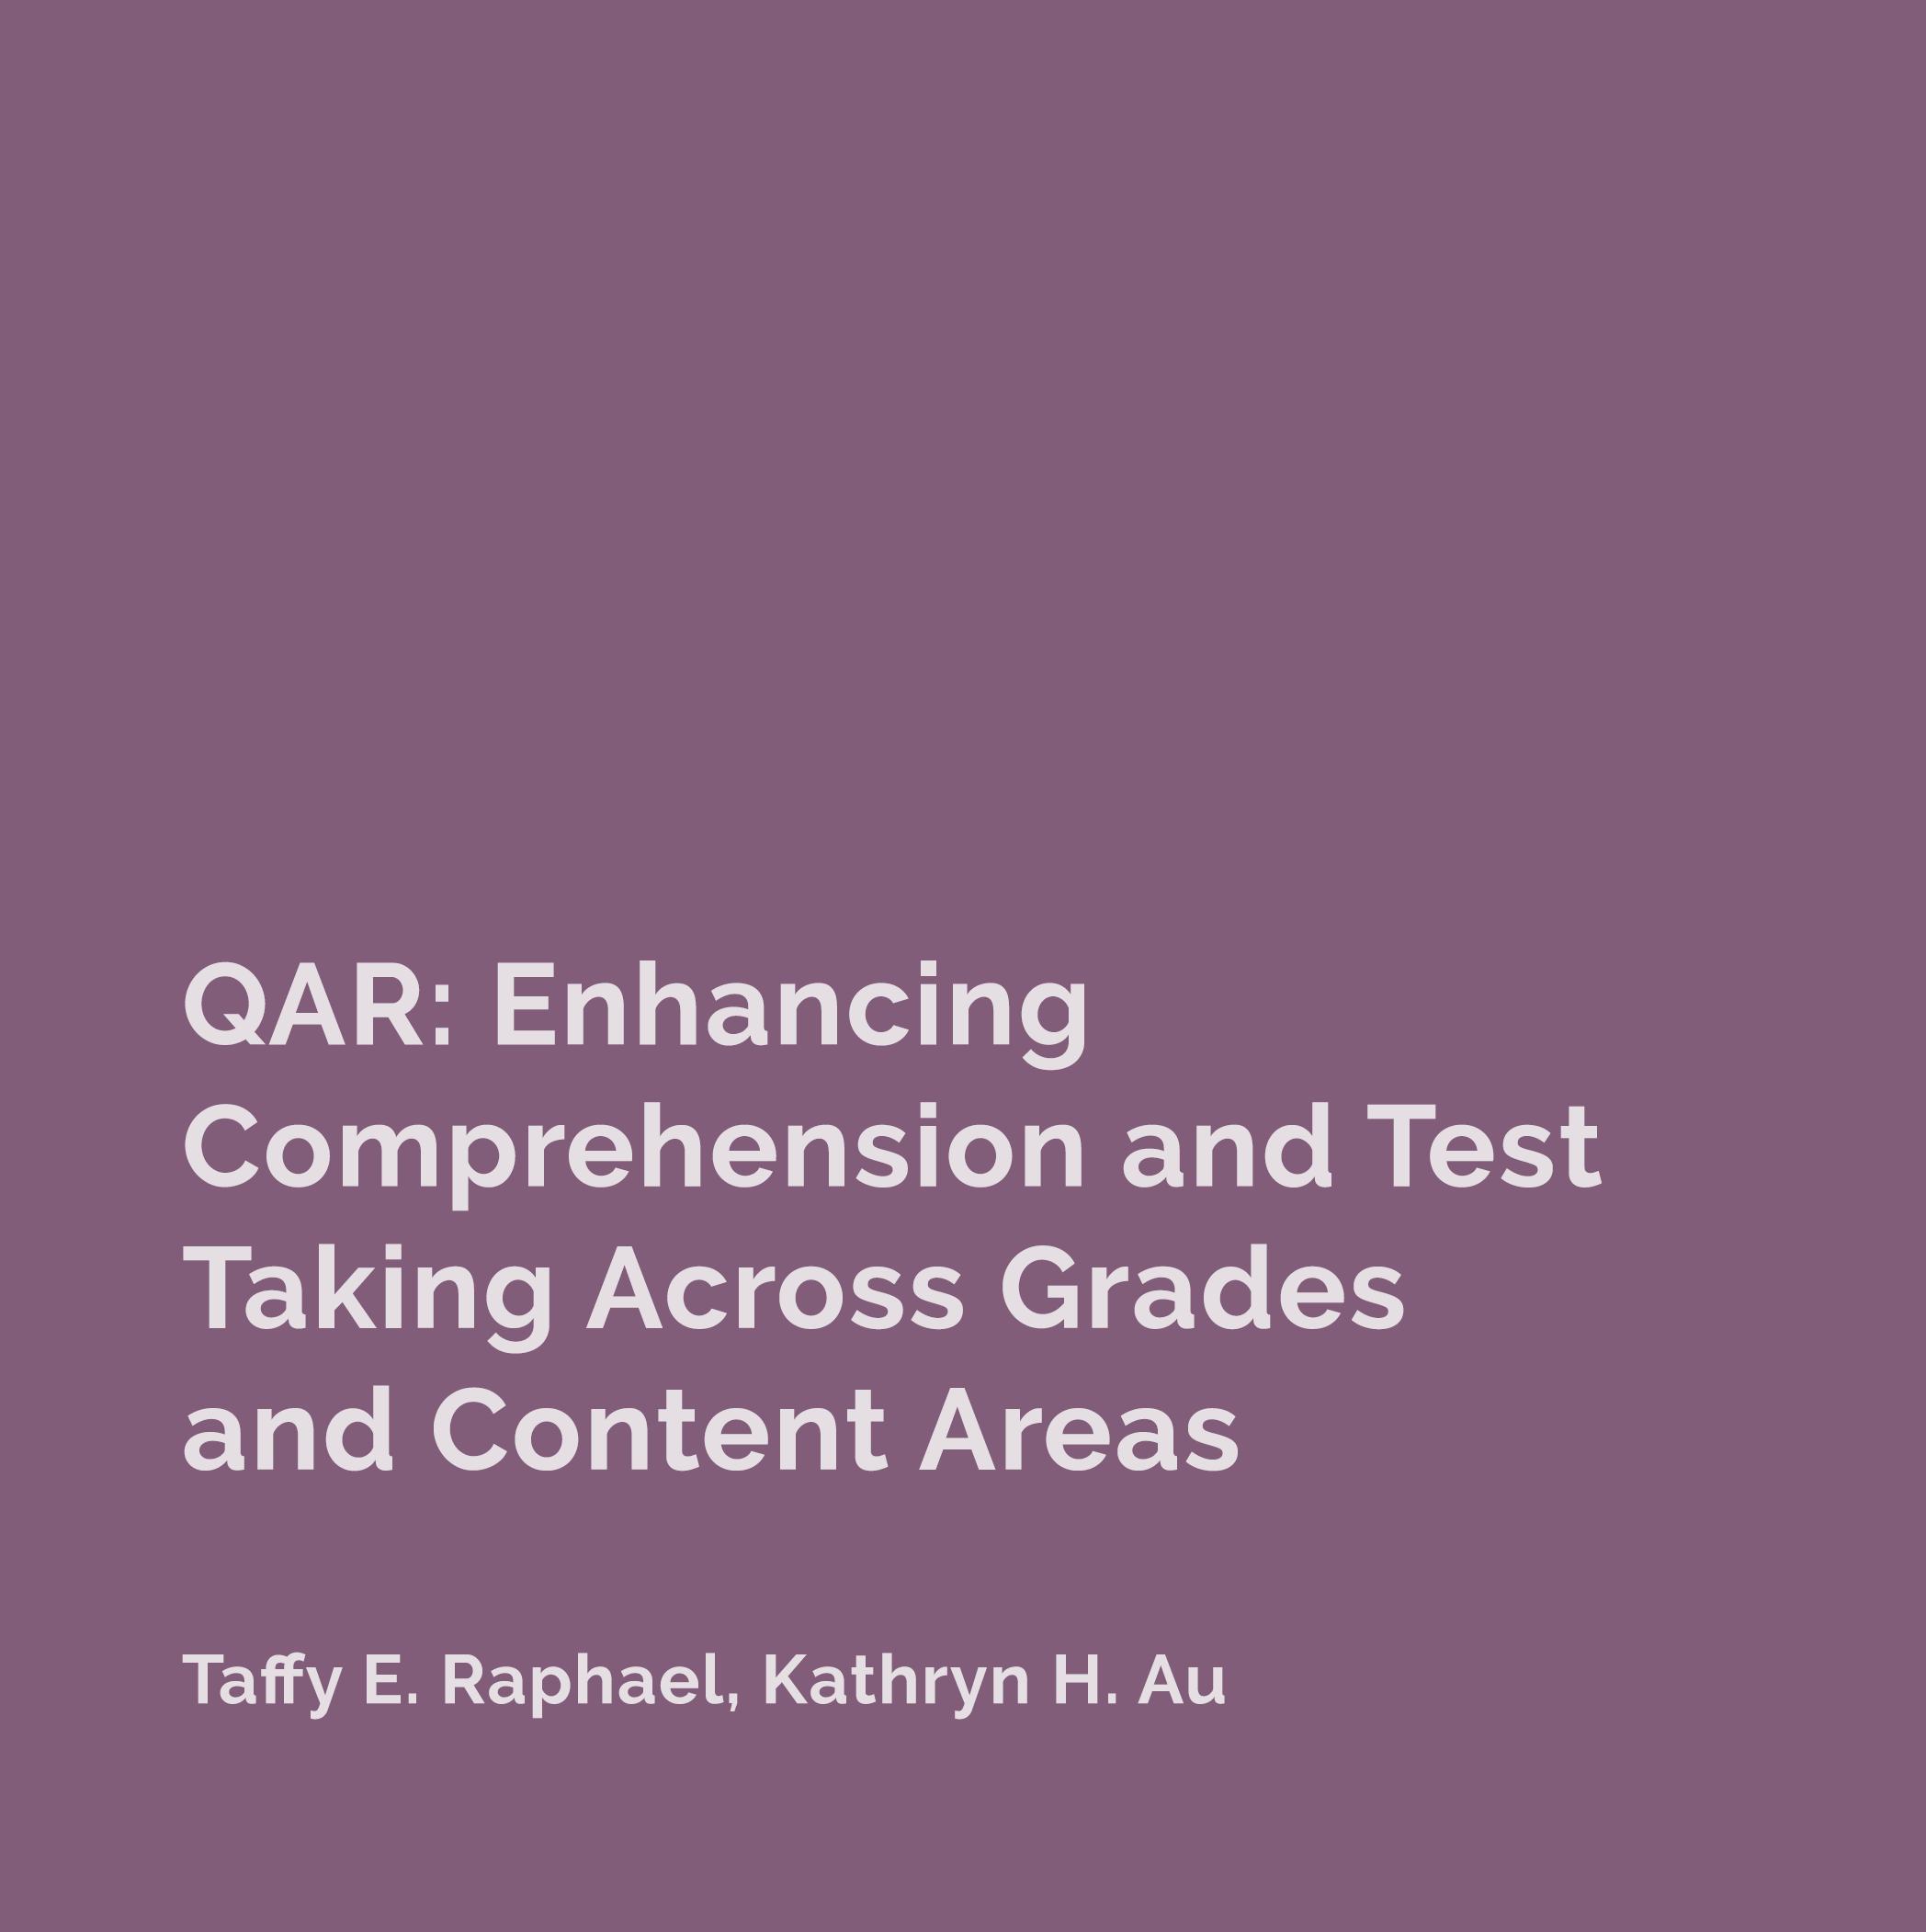 QAR_Enhancing.png